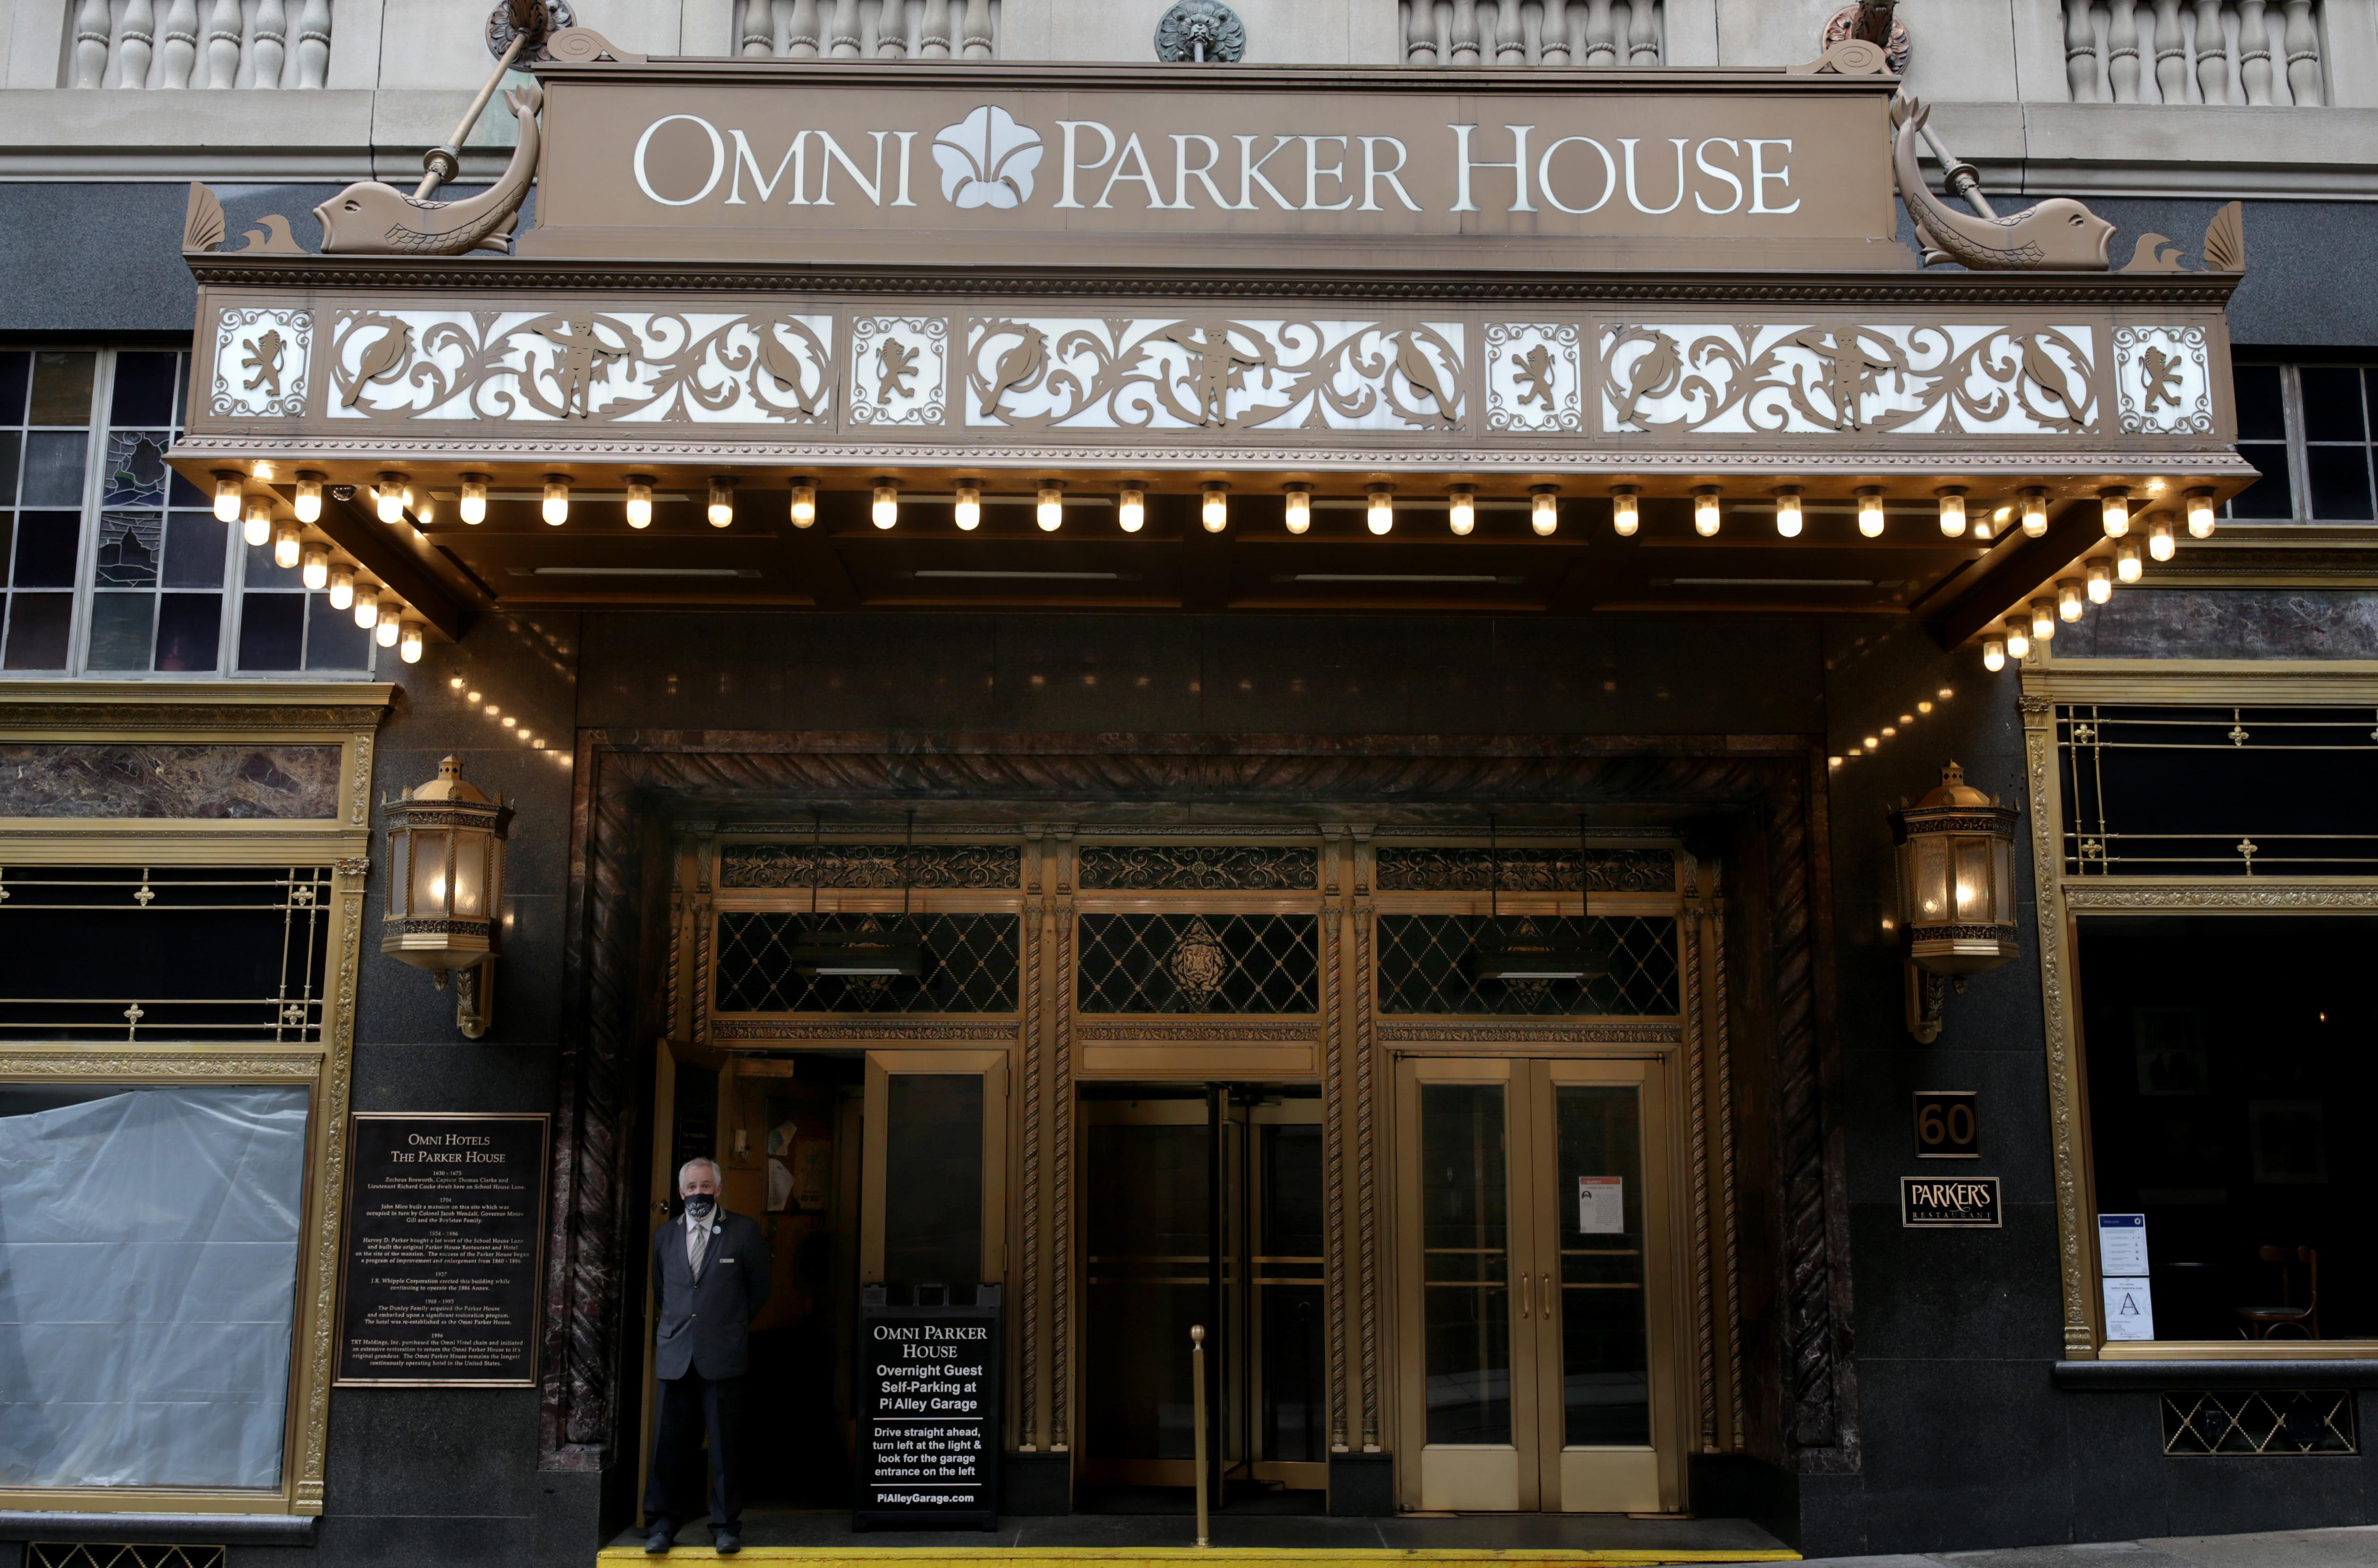 The Boston Omni Parker House.